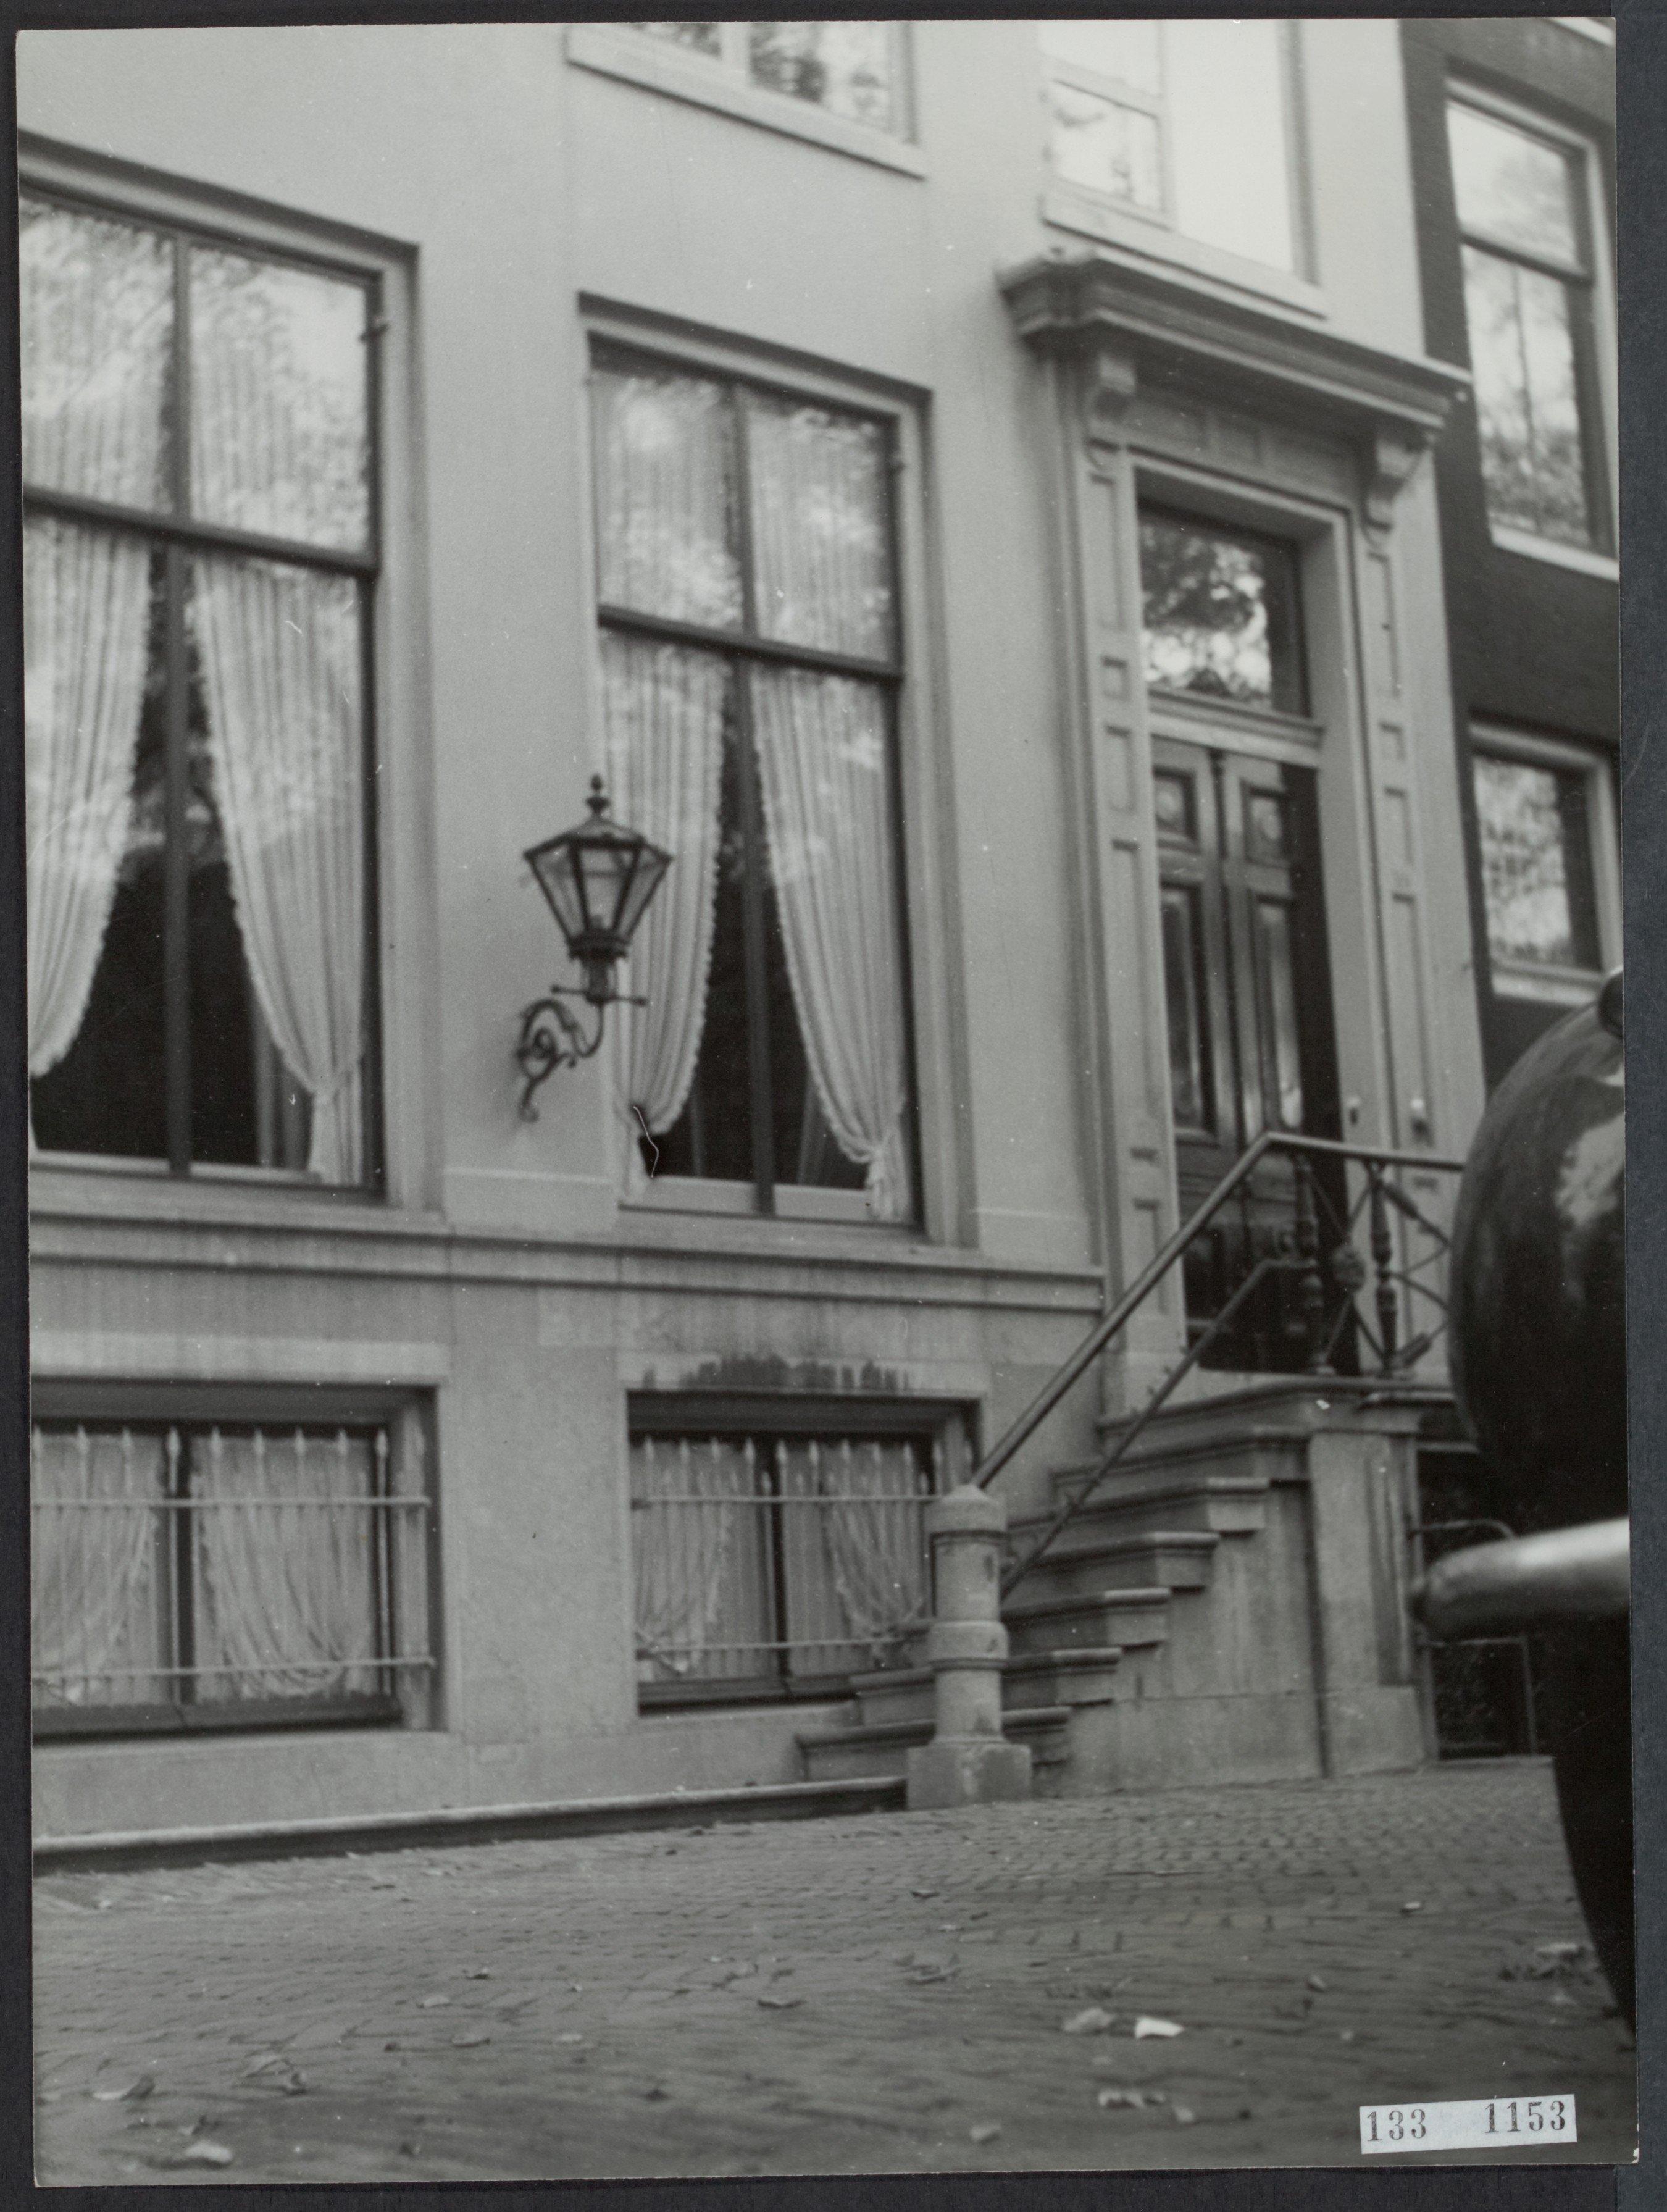 File:Amsterdam. Keizersgracht woonhuis van Han van Meegeren (1889-1947),